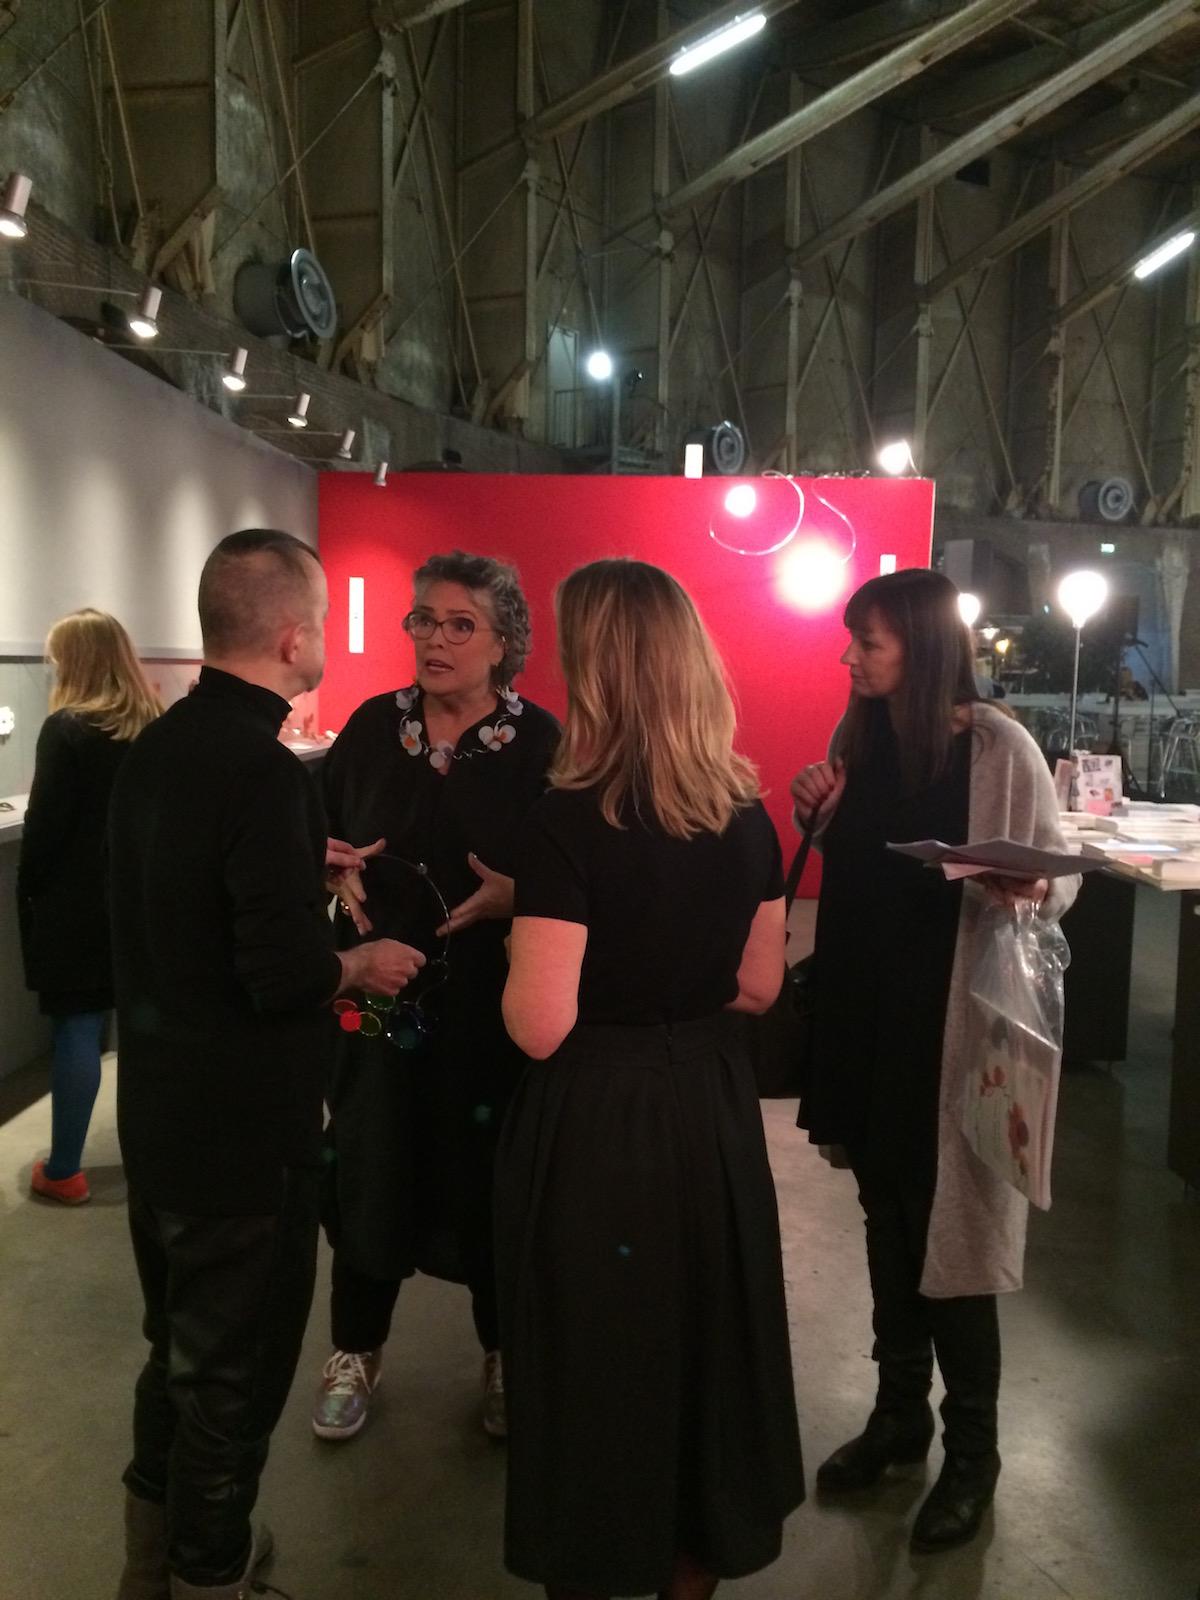 Sieraad Art Fair tijdens de opening op 10 november 2016, foto Arjen Veldt, portret, beurs, Paul Derrez, Isabella van den Bos, prinses Margarita, Gashouder, Westergasfabriek, Amsterdam